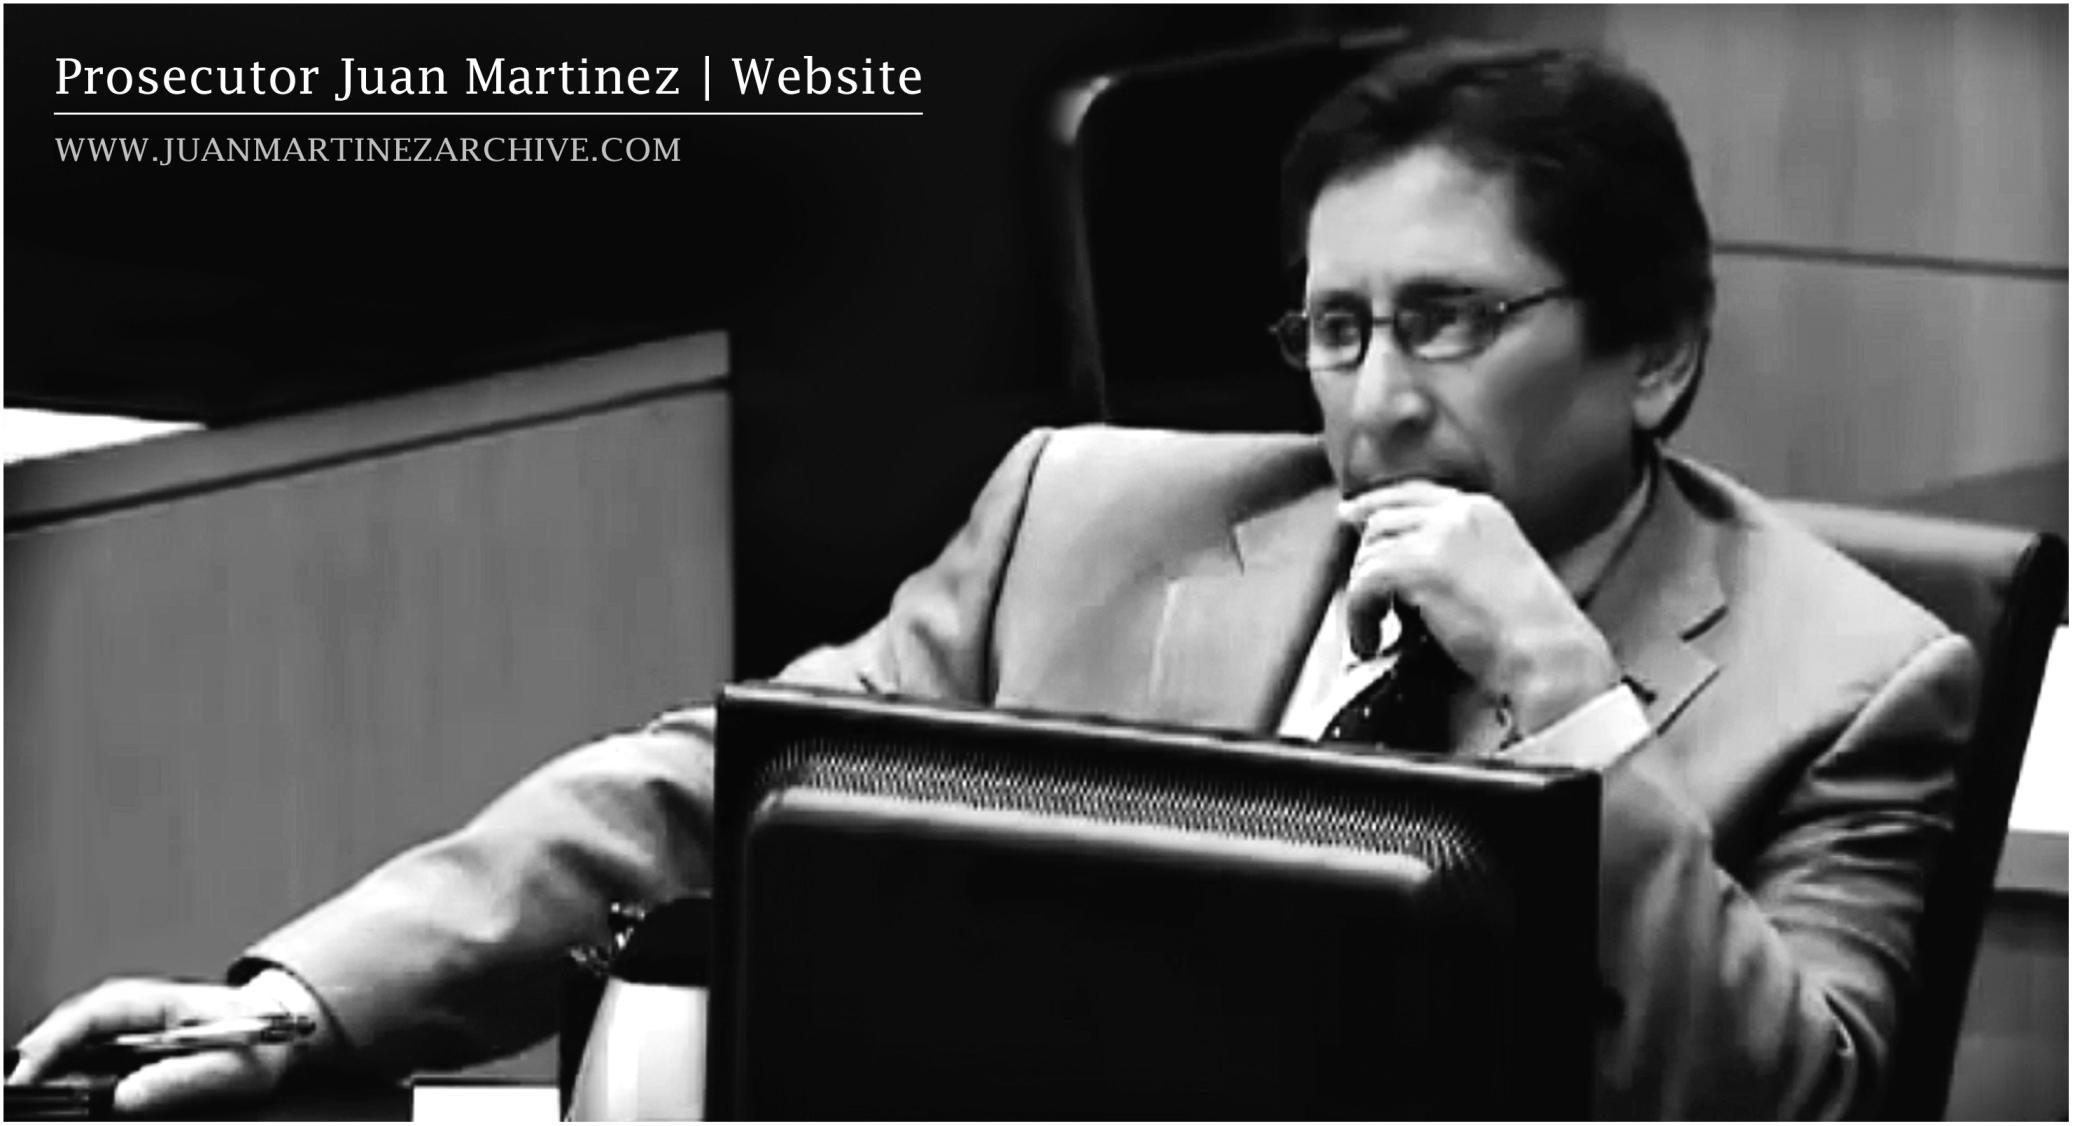 Juan Martinez Arizona Prosecutor